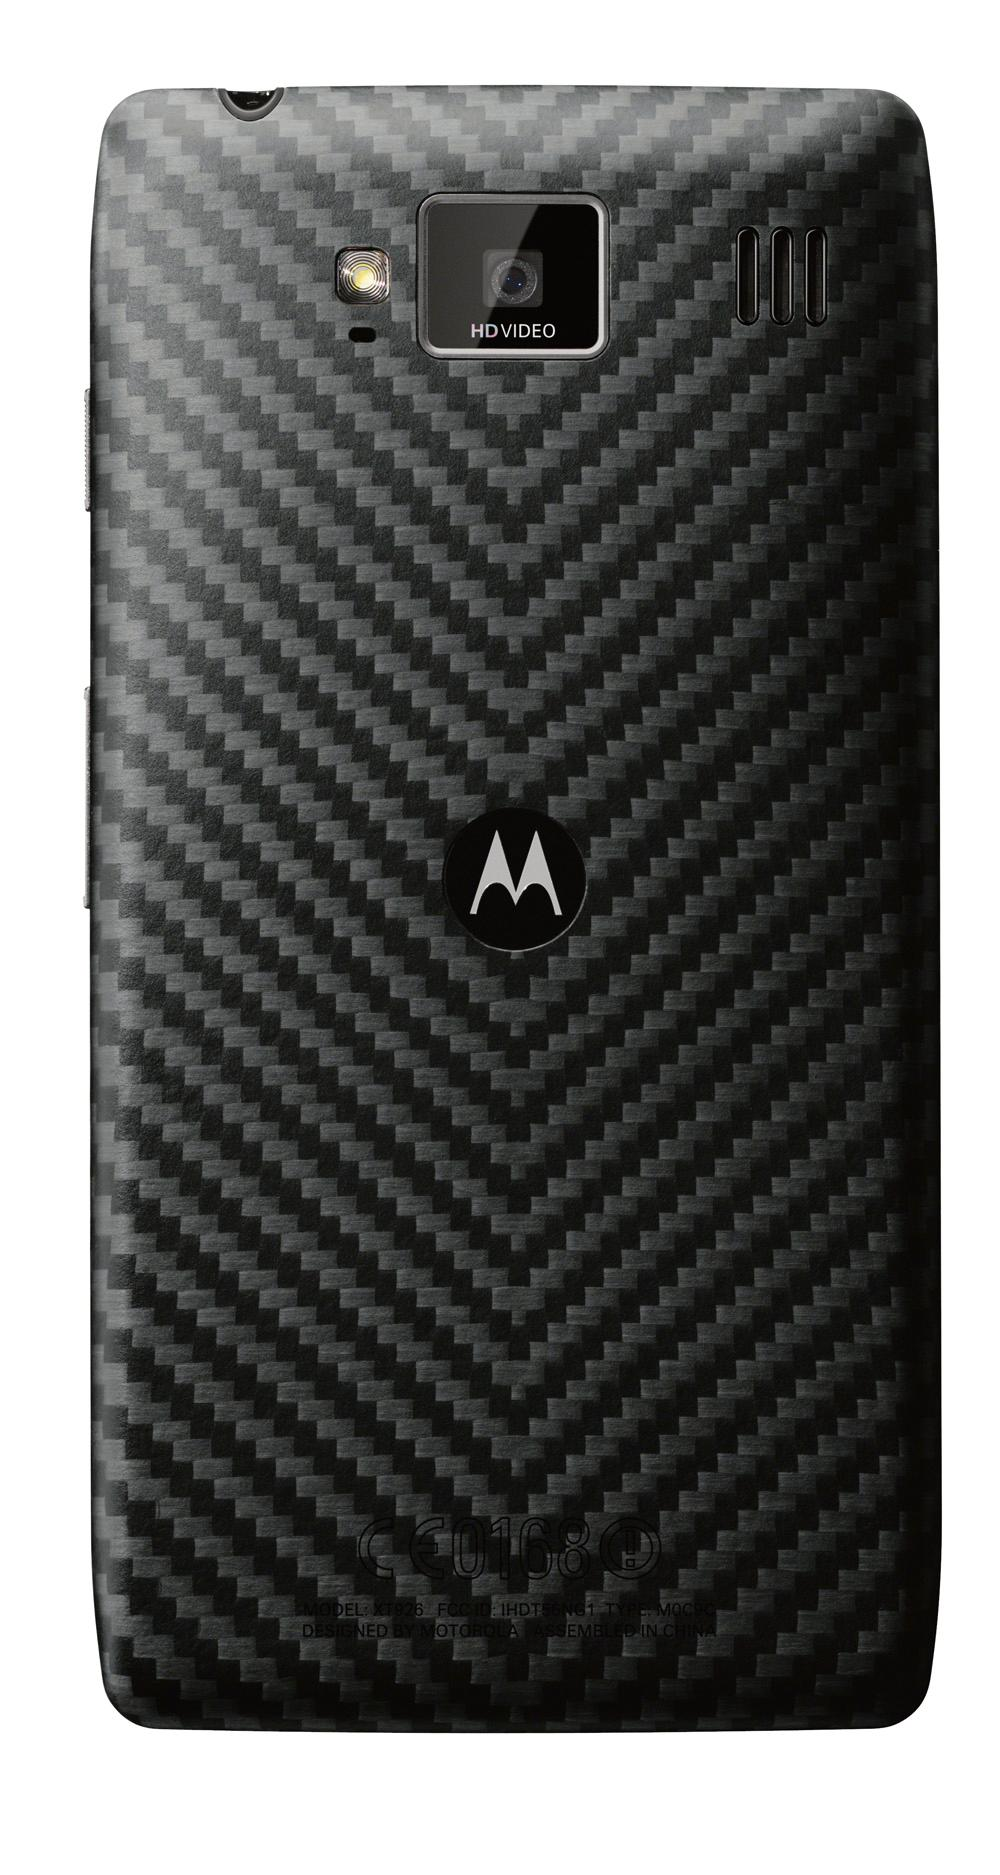 Baksiden av Motorola Razr HD er laget i kevlar.Foto: Motorola